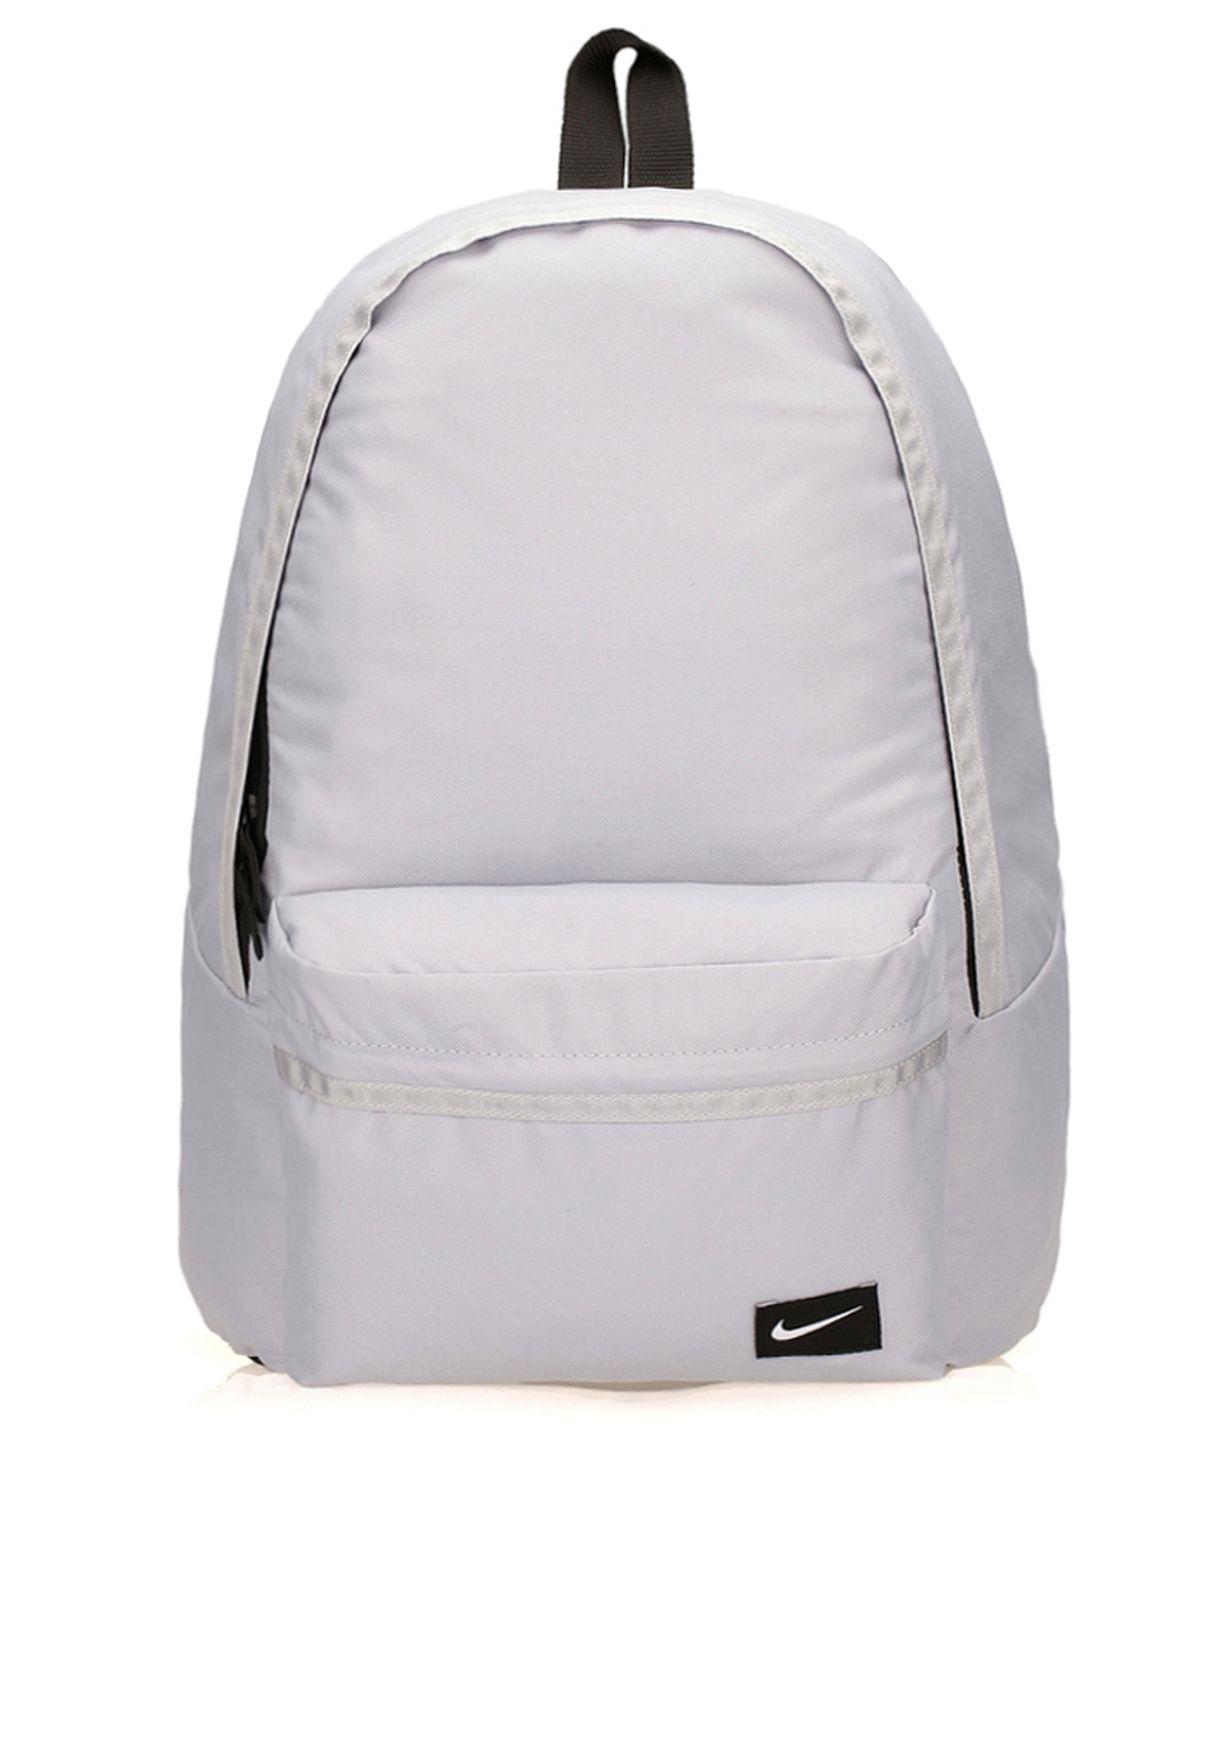 6761bde84c Shop Nike white All Access Backpack NEQP-BA4302-017 for Men in Bahrain -  NI727AC47FNG